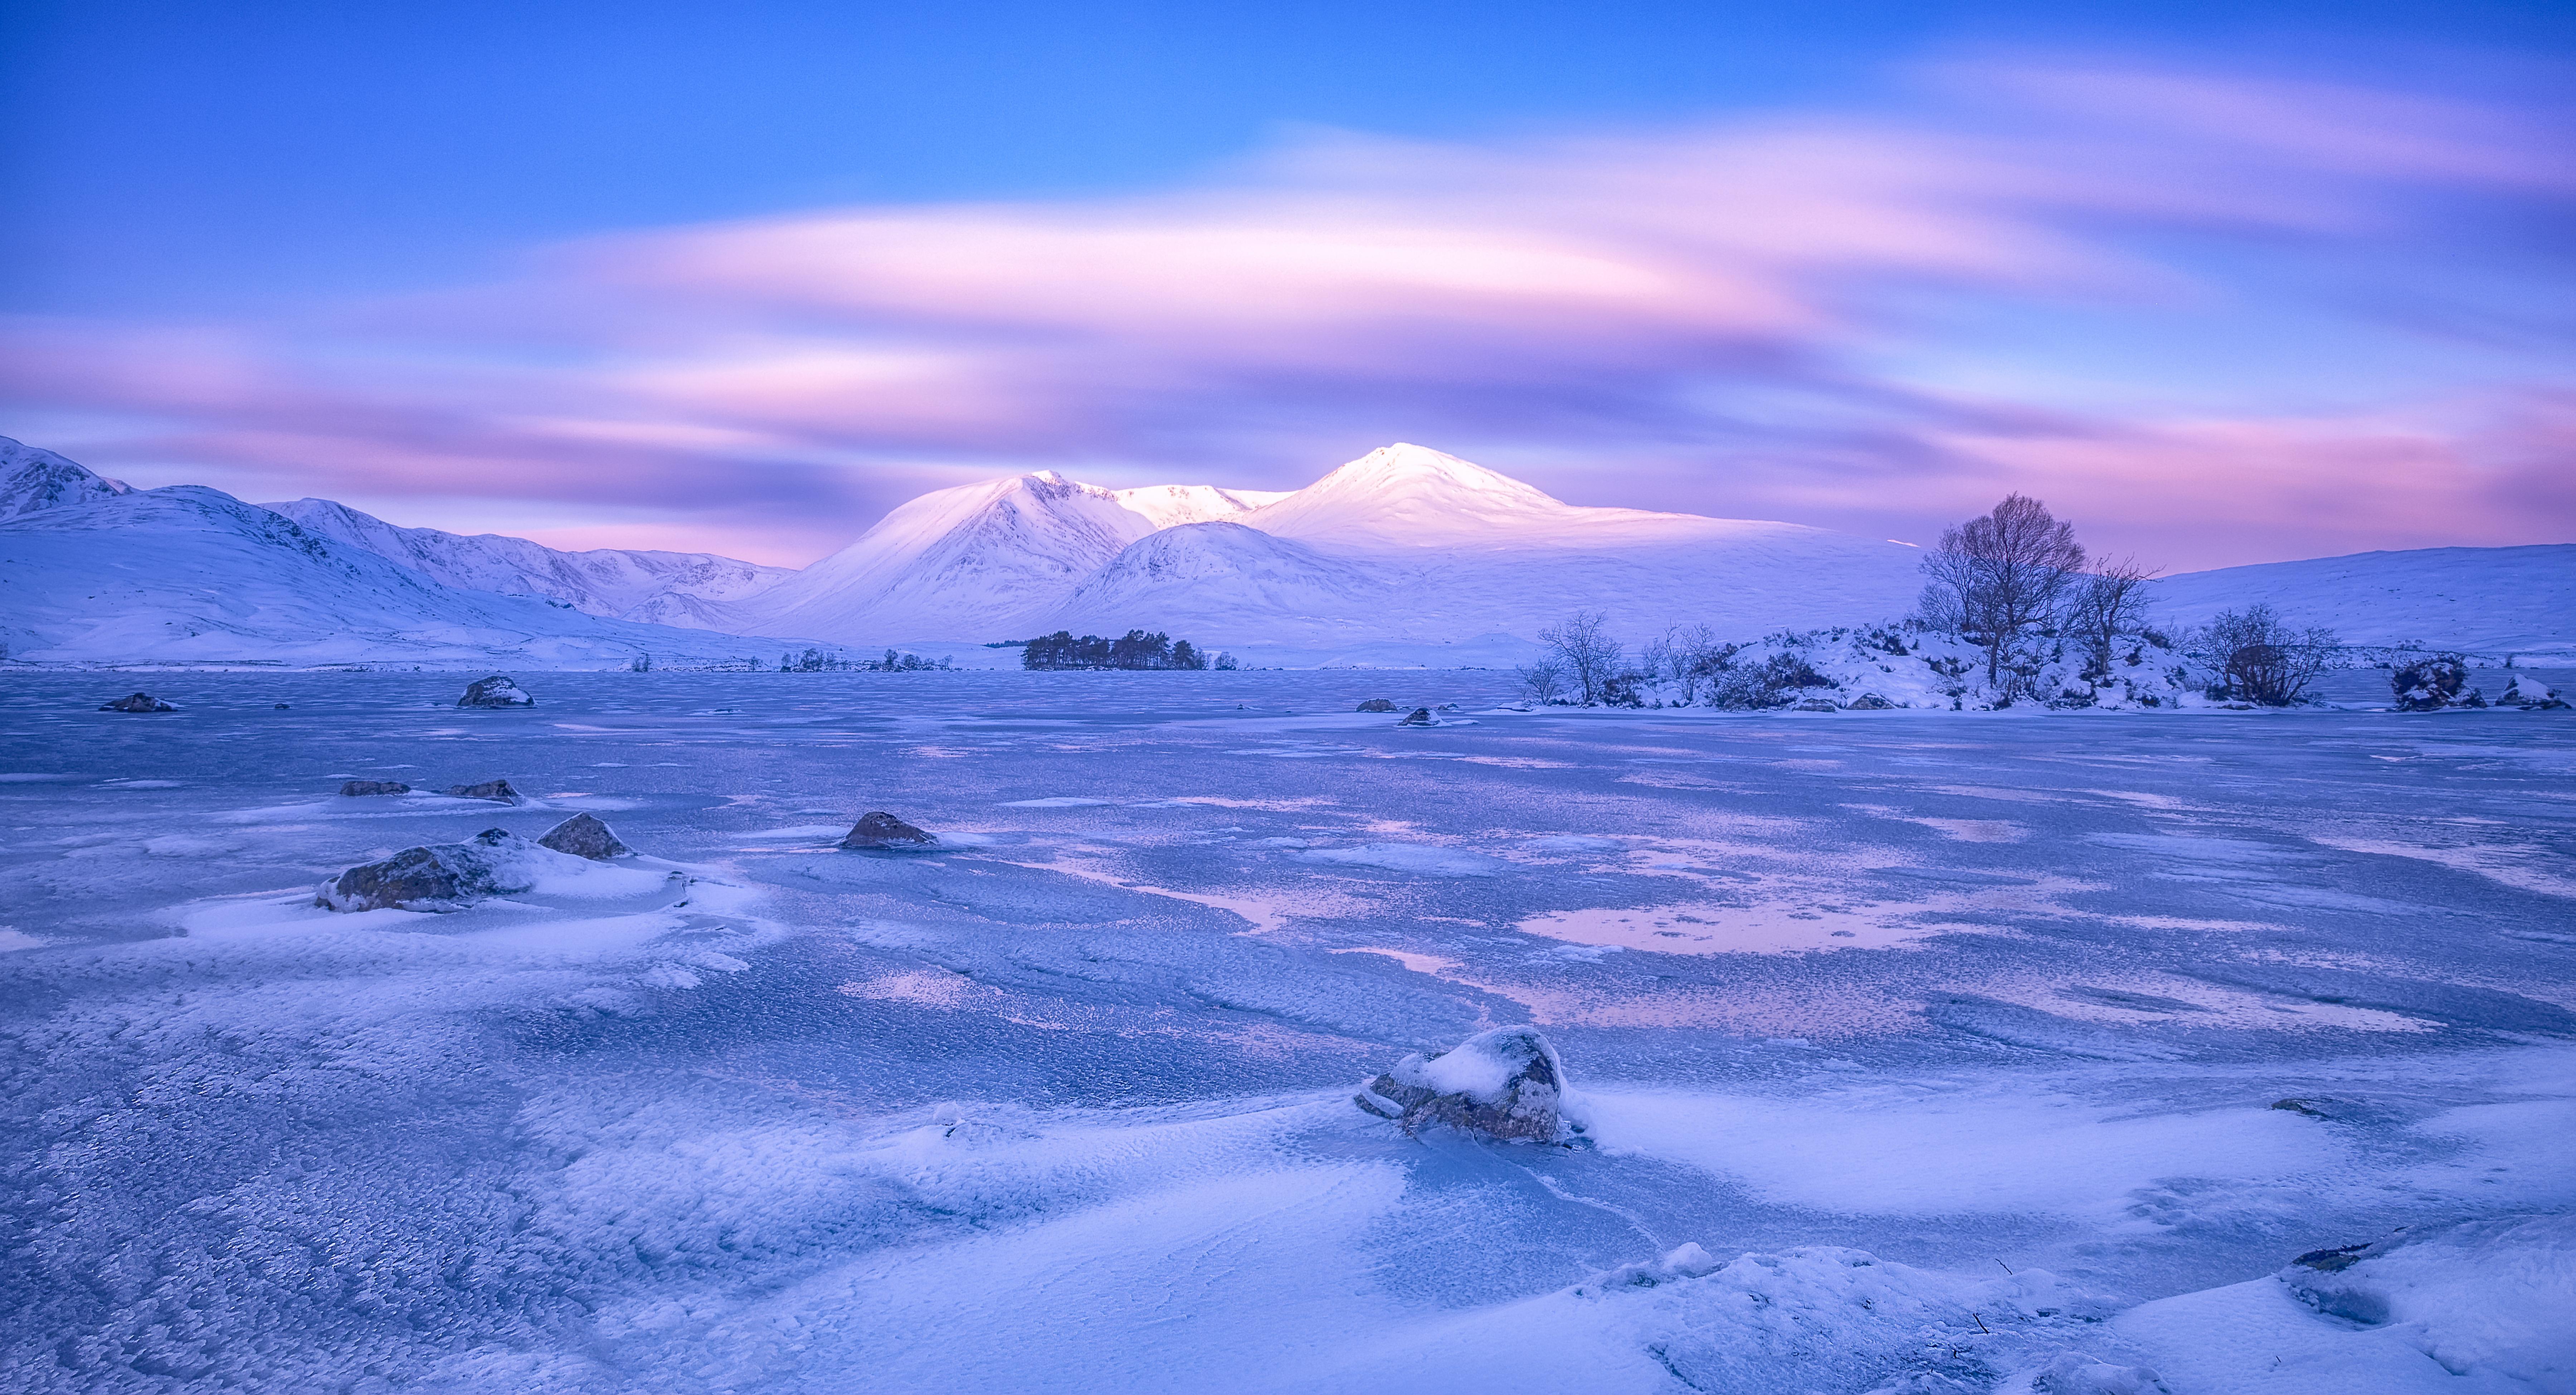 горы камни снег зима  № 2512965 бесплатно